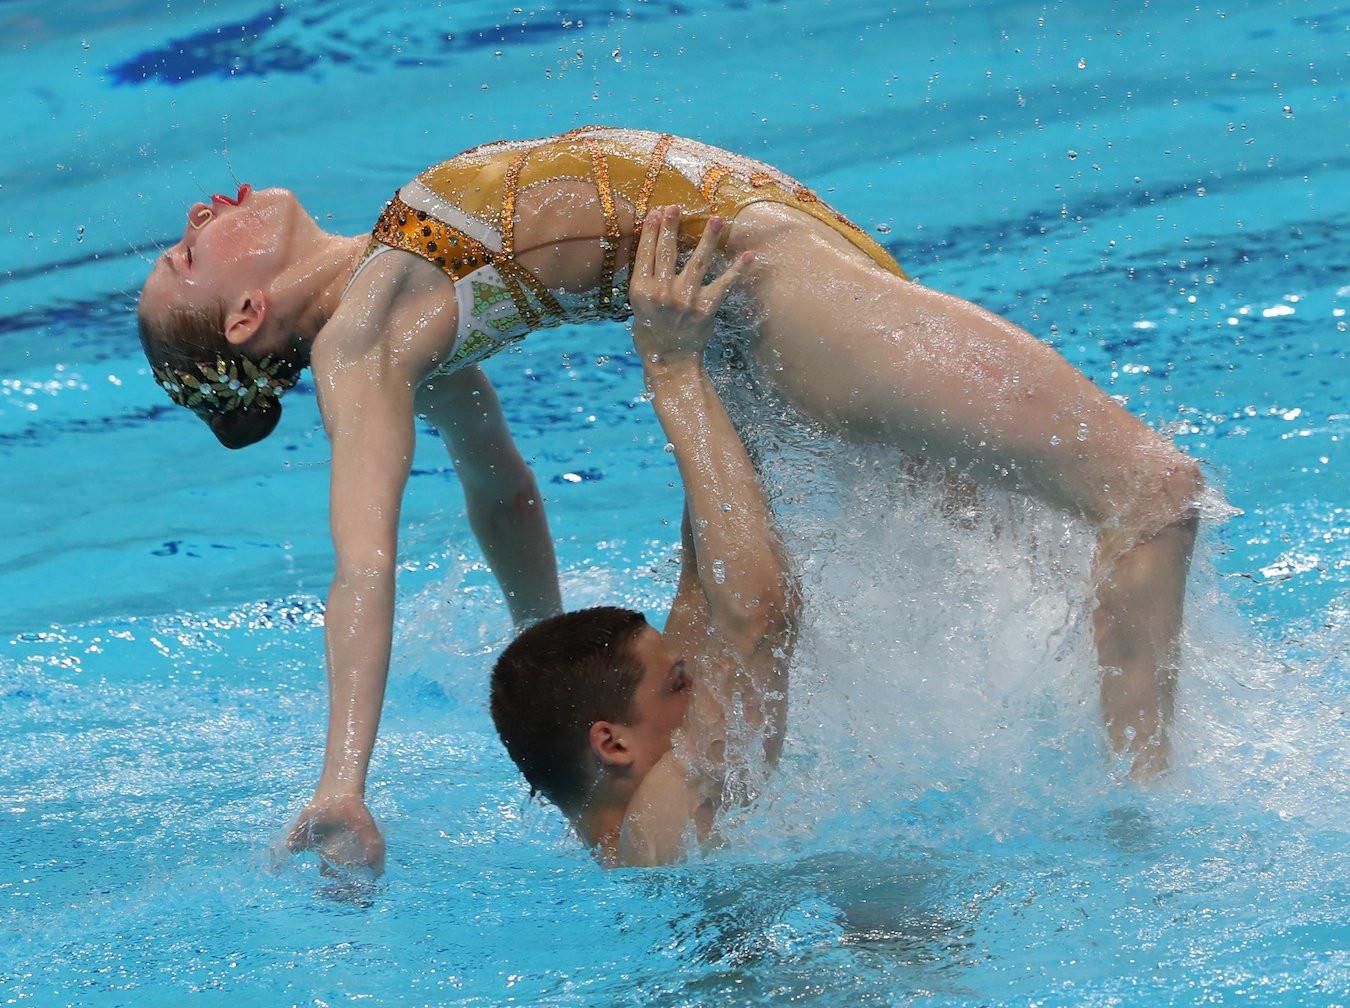 Alina Mantulenko and Mikhail Vasilez won gold in the mixed duet free final in their last performance as juniors ©FINA